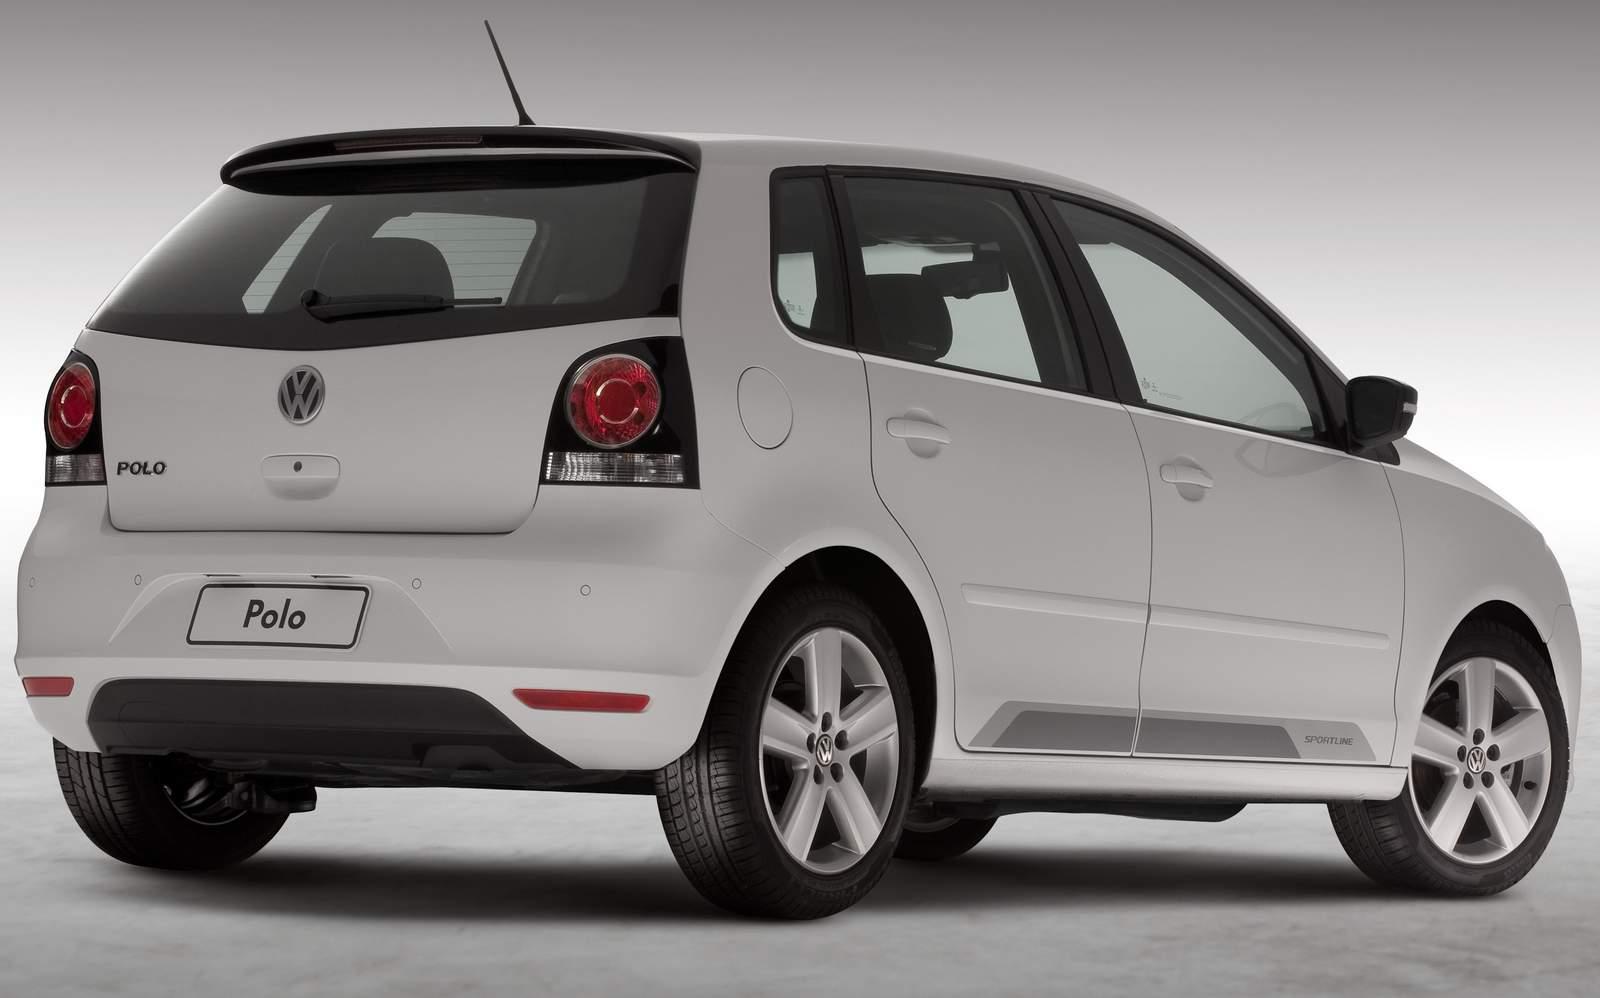 436bee4586 VW Polo 2014 - preços partem de R  47.810